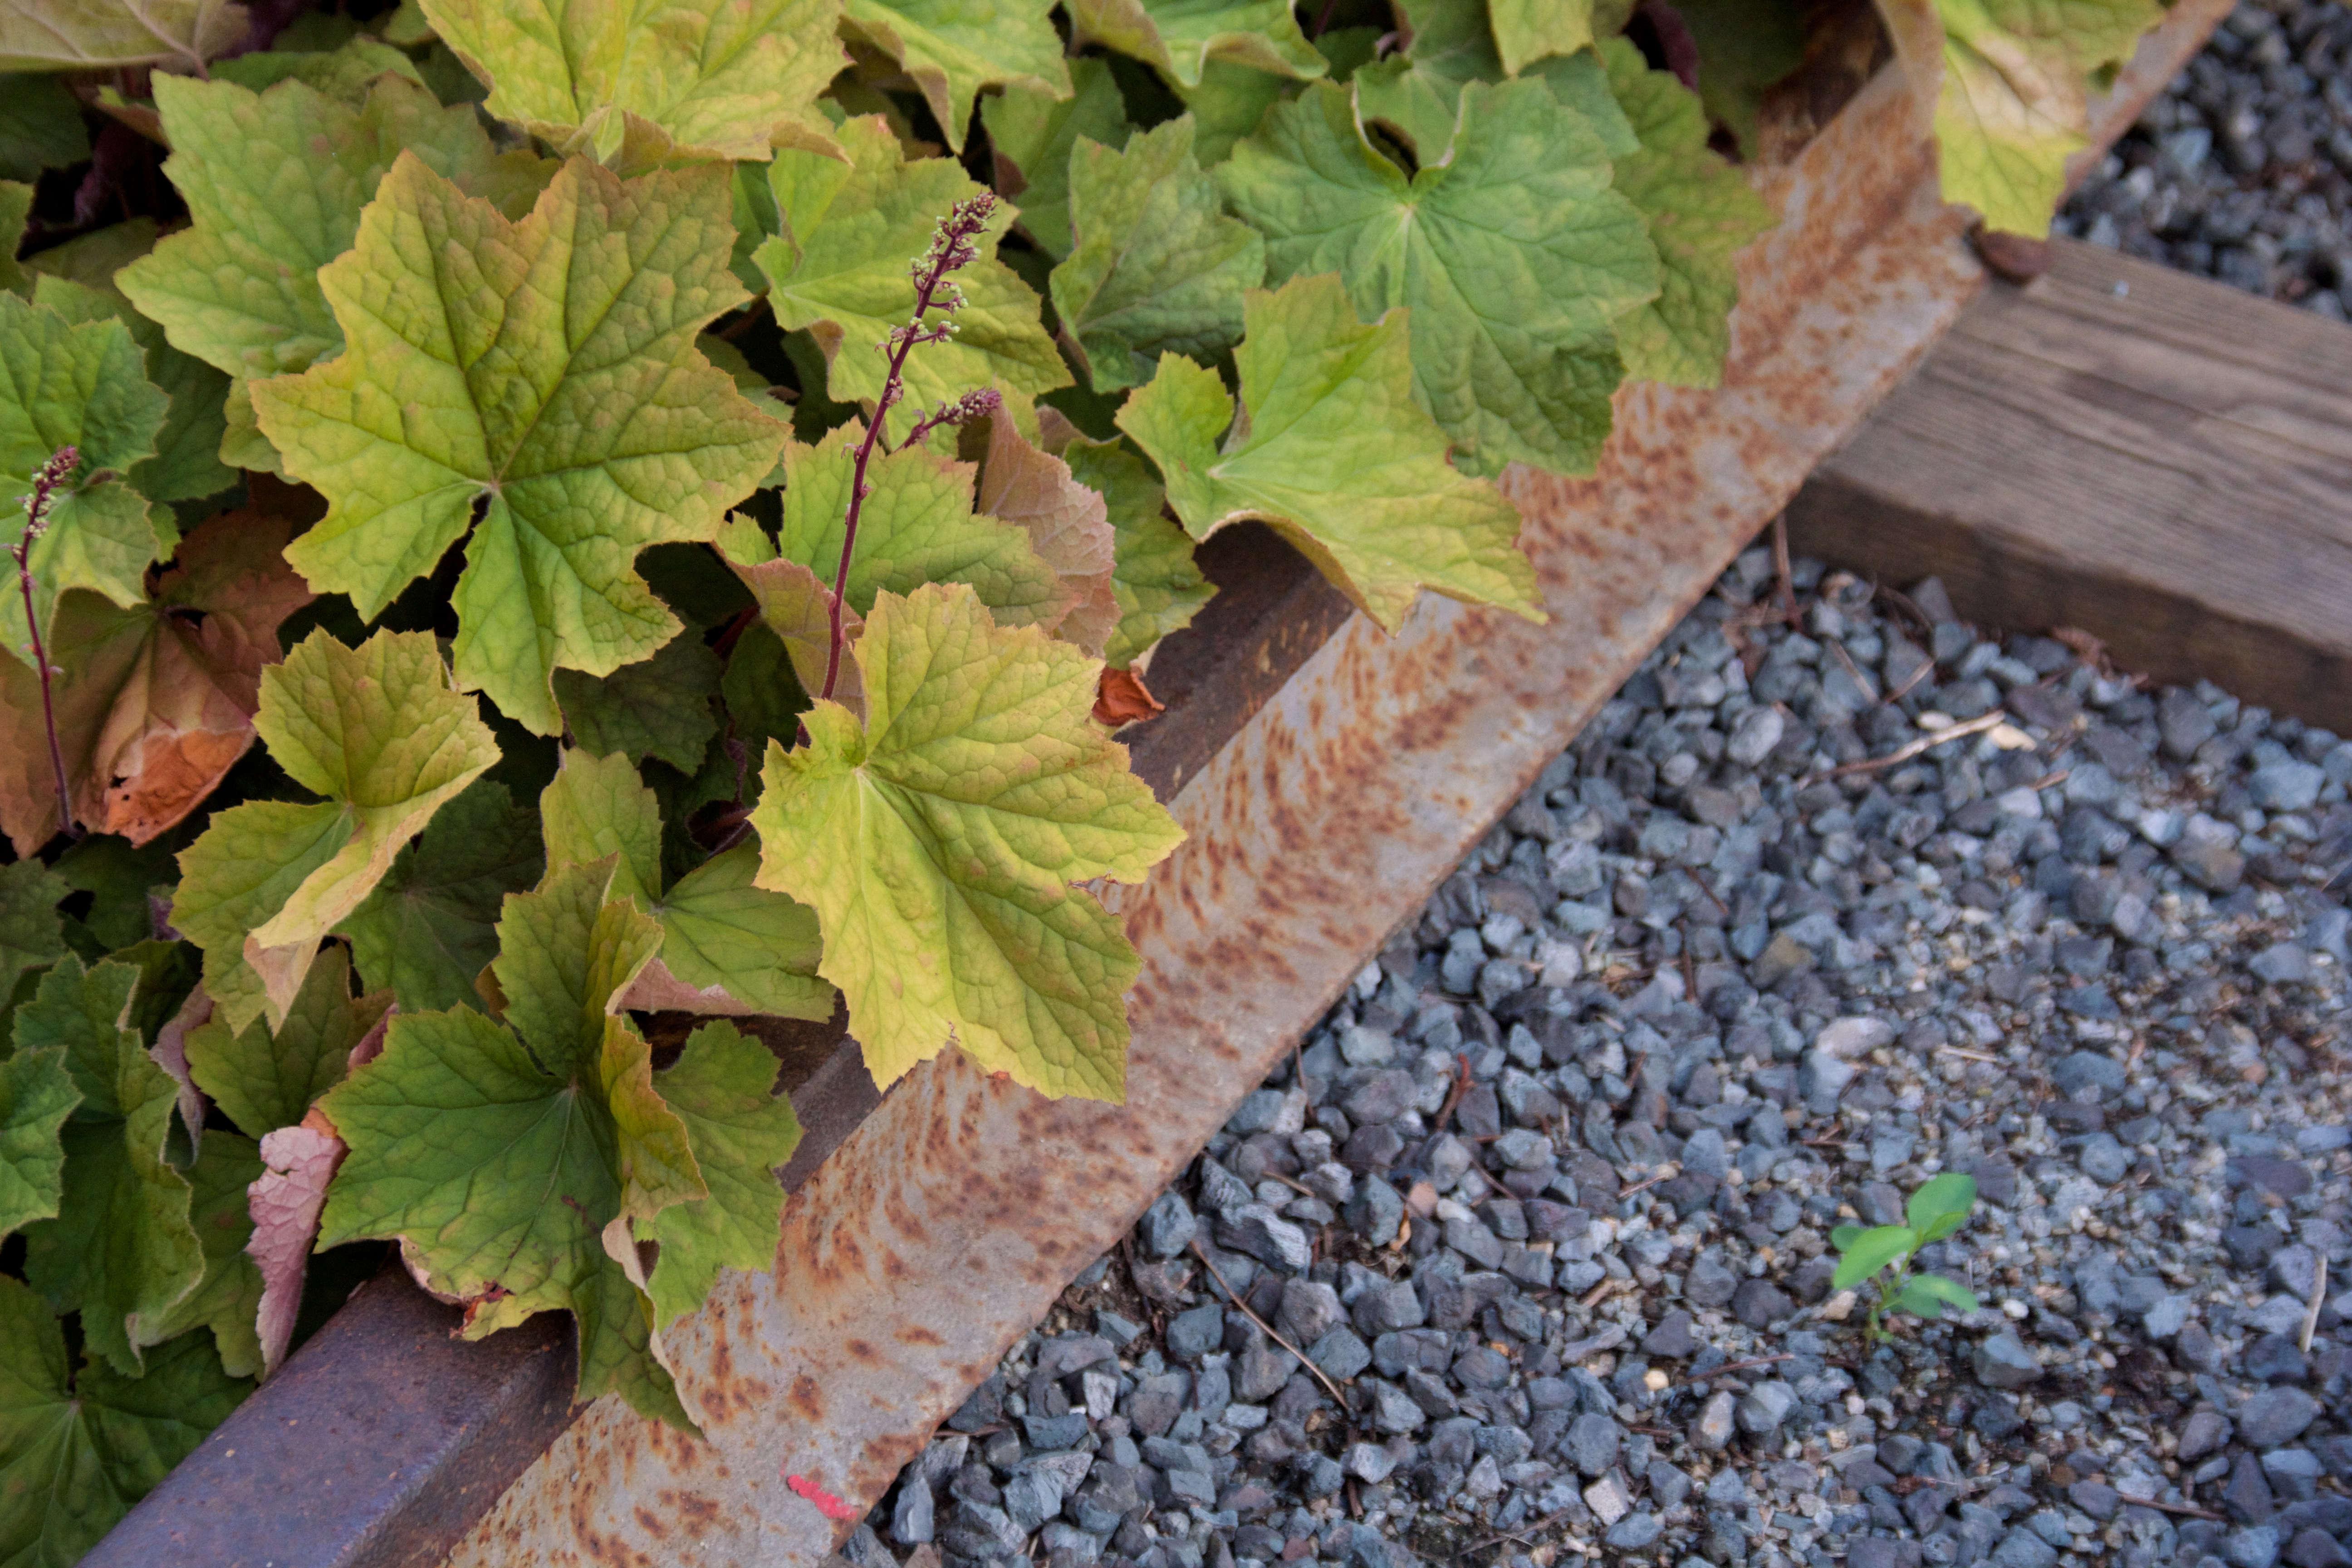 high-line-gravel-rusted-metal-tracks-mike-peel-wikimedia